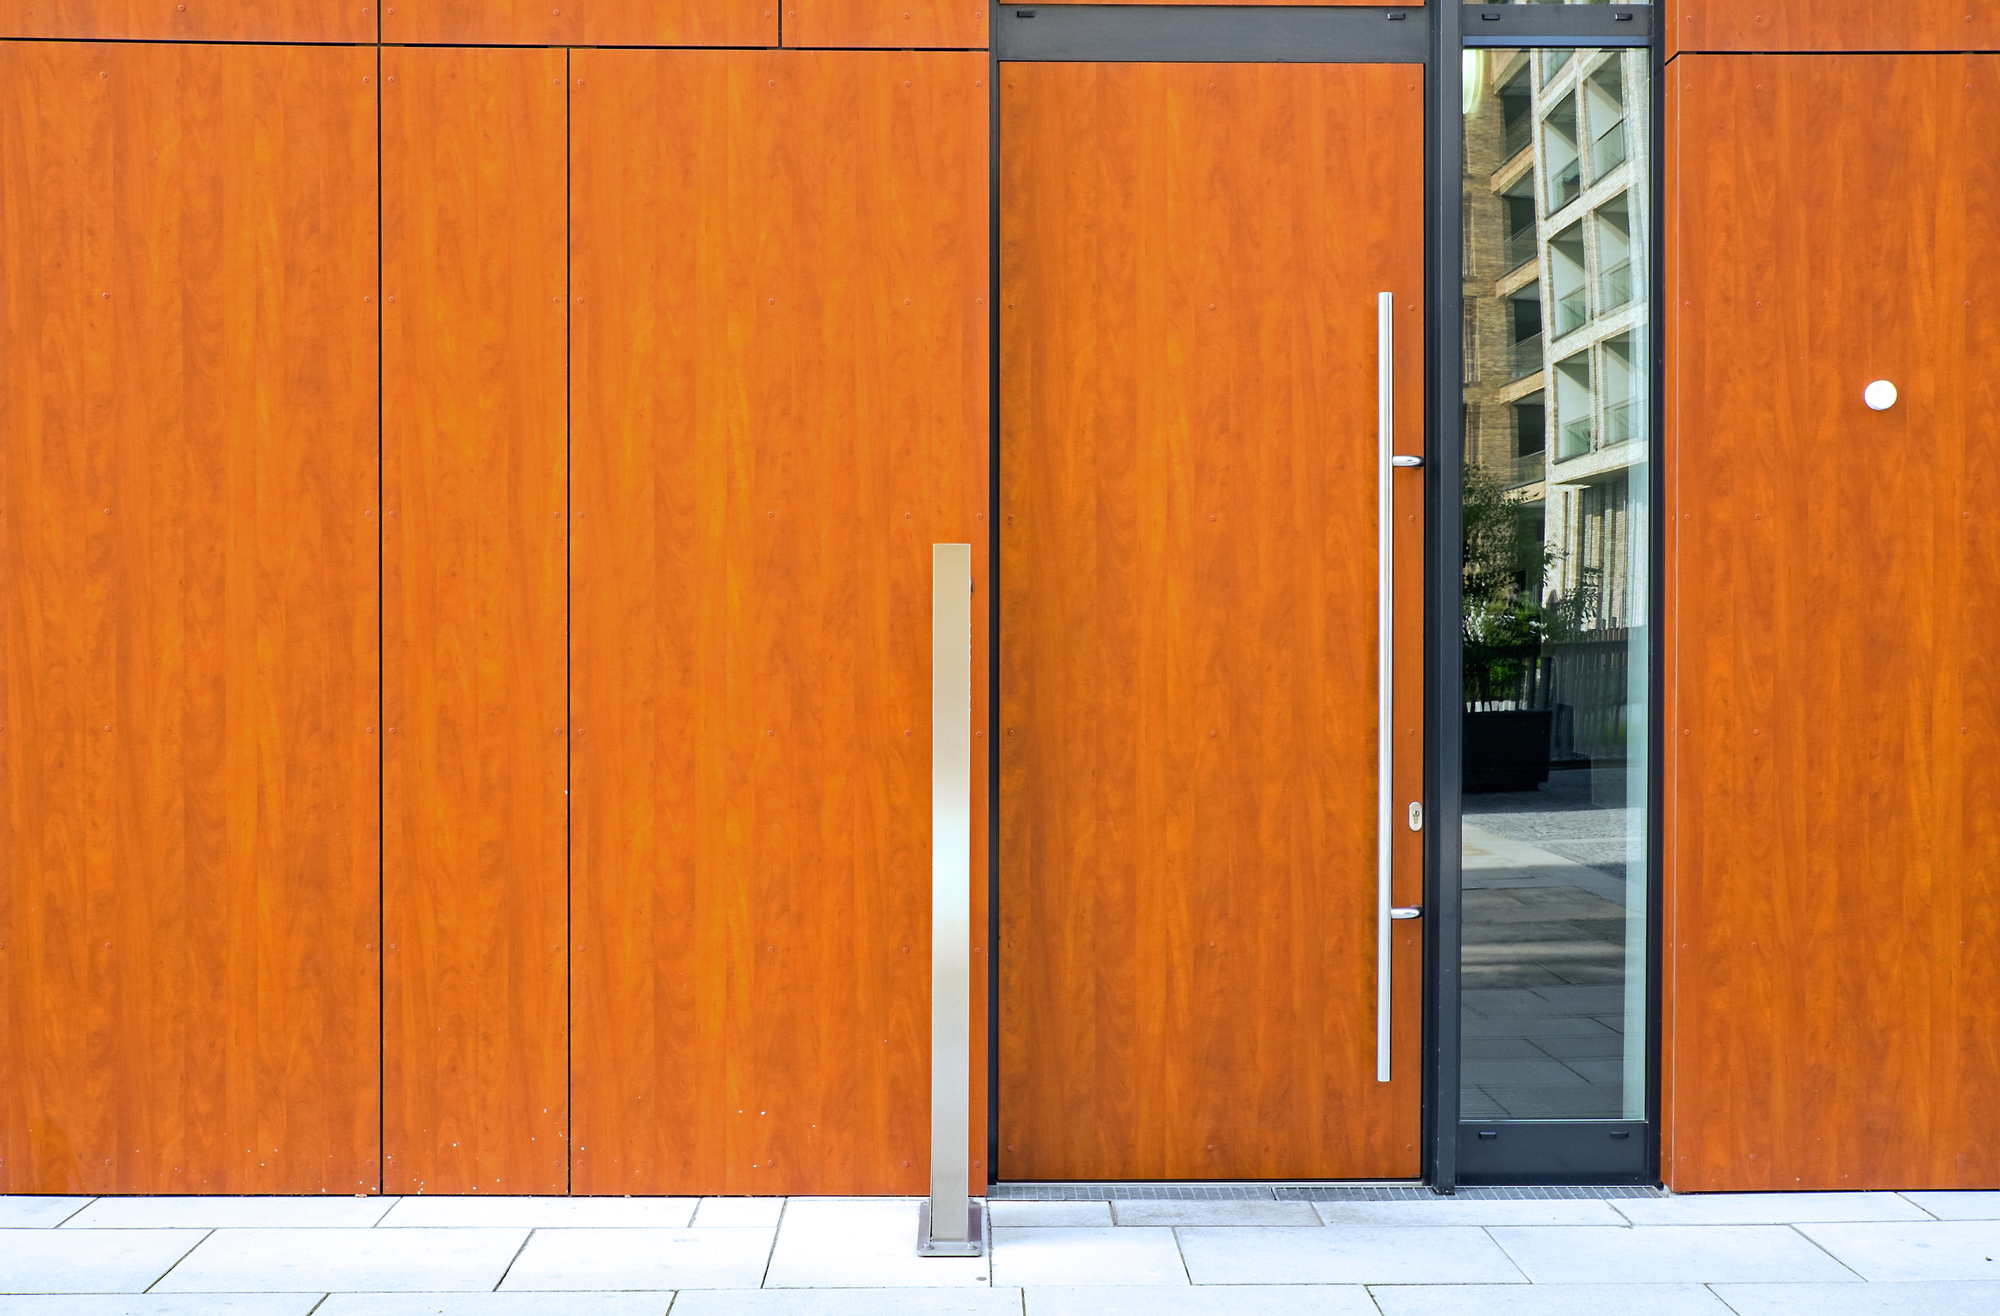 Beautiful porte ingresso prezzi photos acrylicgiftware - Porte da ingresso prezzi ...